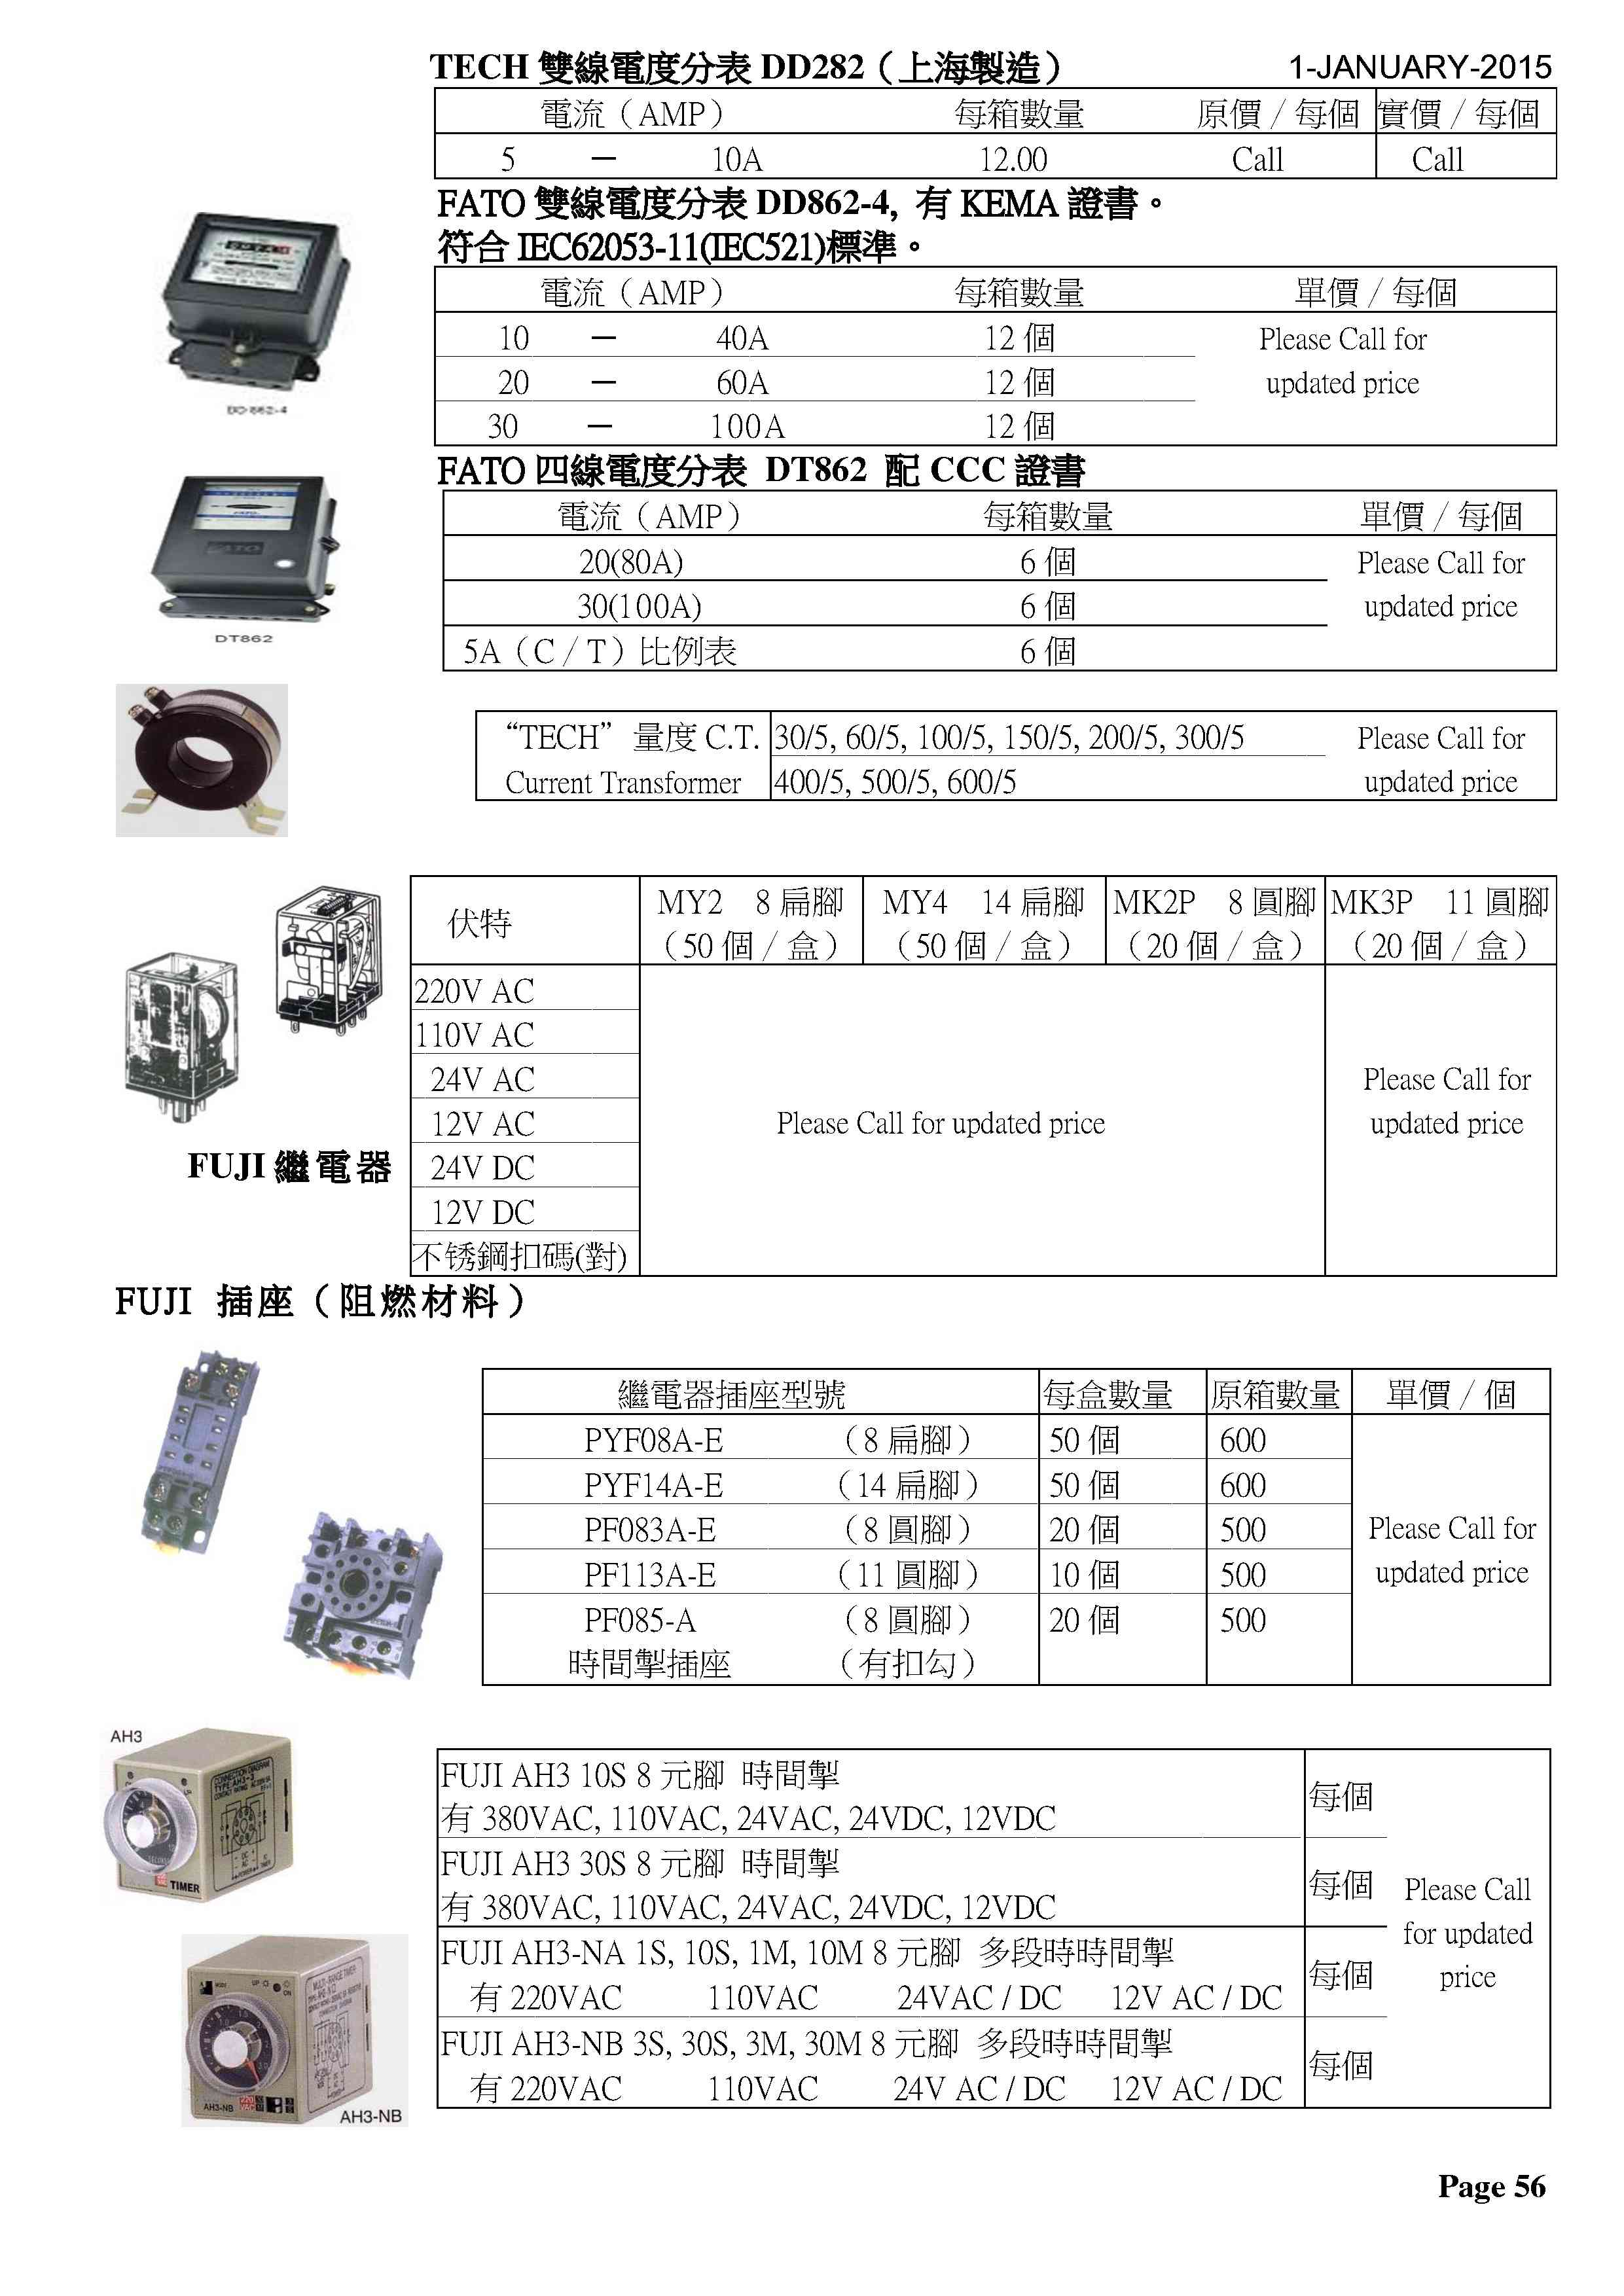 P56 - TECH 電表及FUJI-RELAY1